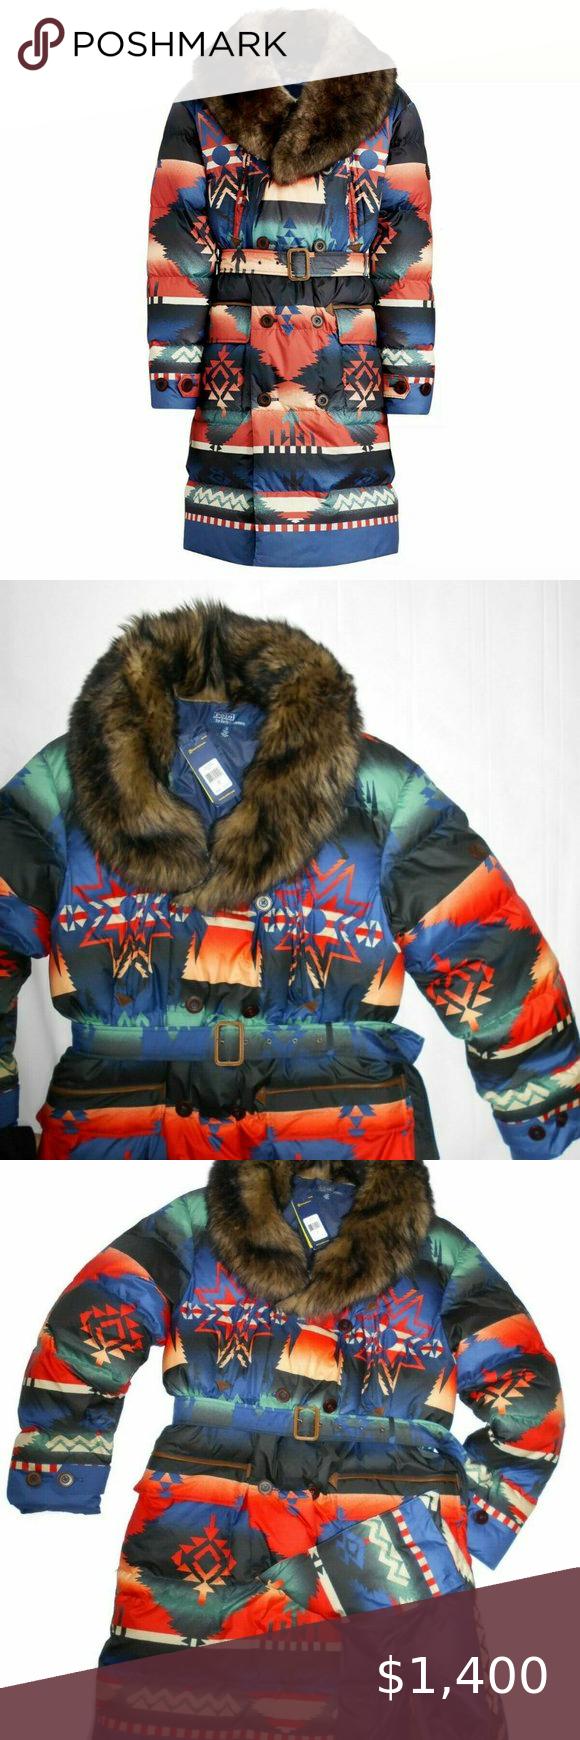 Polo Ralph Lauren Shearling Puffer Coat Jacket Xl Polo Ralph Lauren Mens Shearling Fur Down Southwestern P Puffer Coat Polo Ralph Lauren Ralph Lauren Jackets [ 1740 x 580 Pixel ]